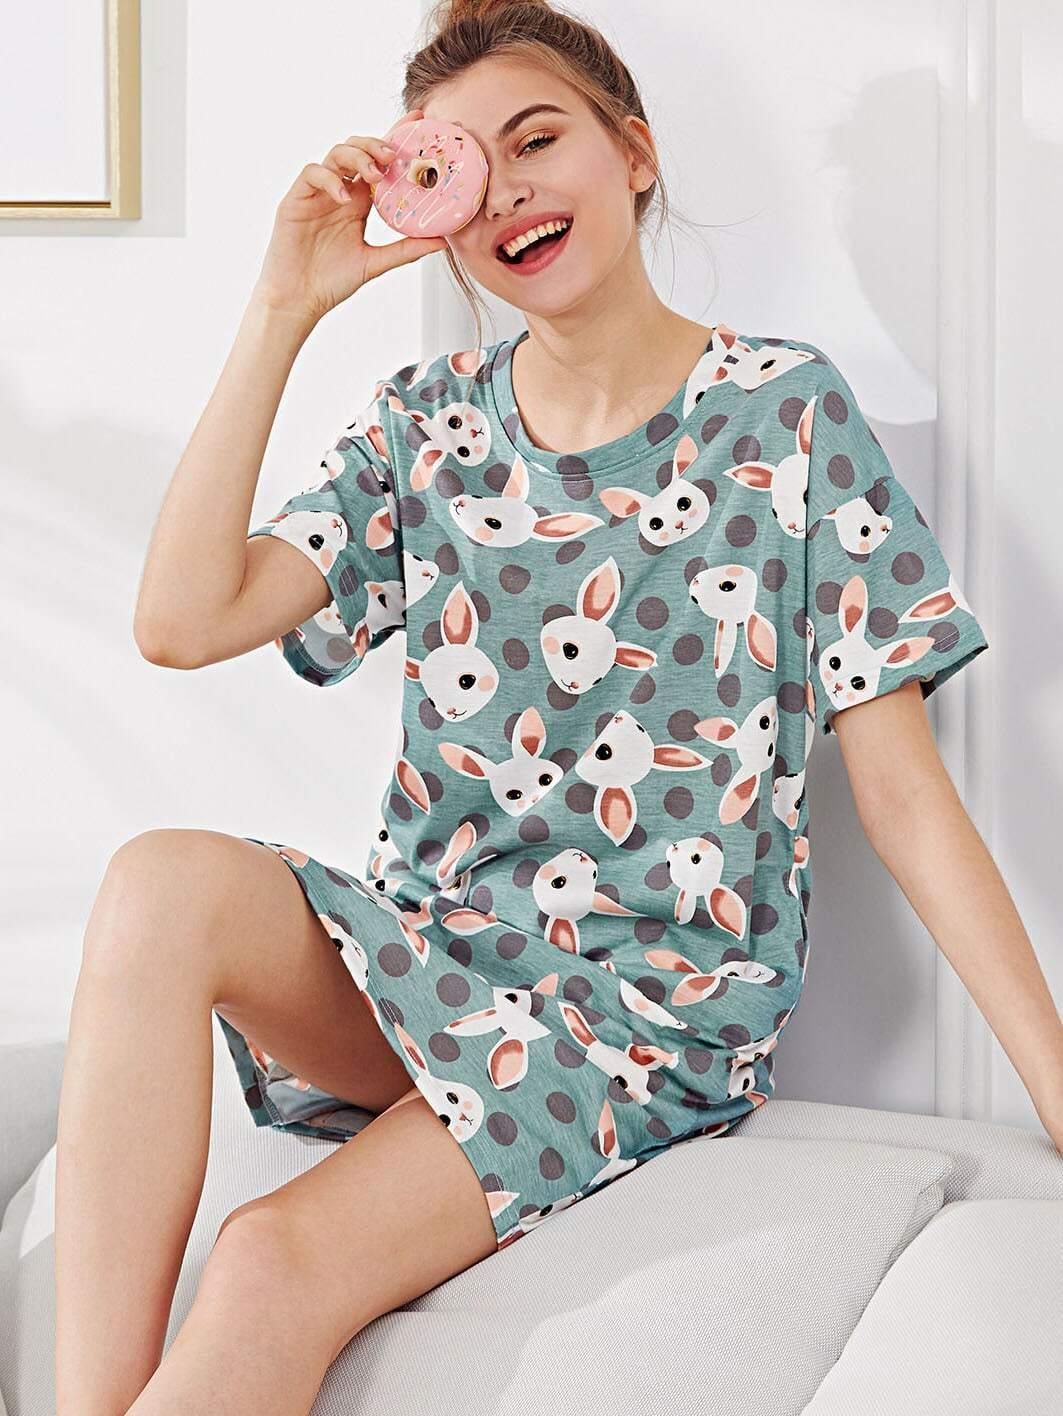 Rabbit Print Polka Dot Night Dress sweet kids satchel with rabbit and polka dot design